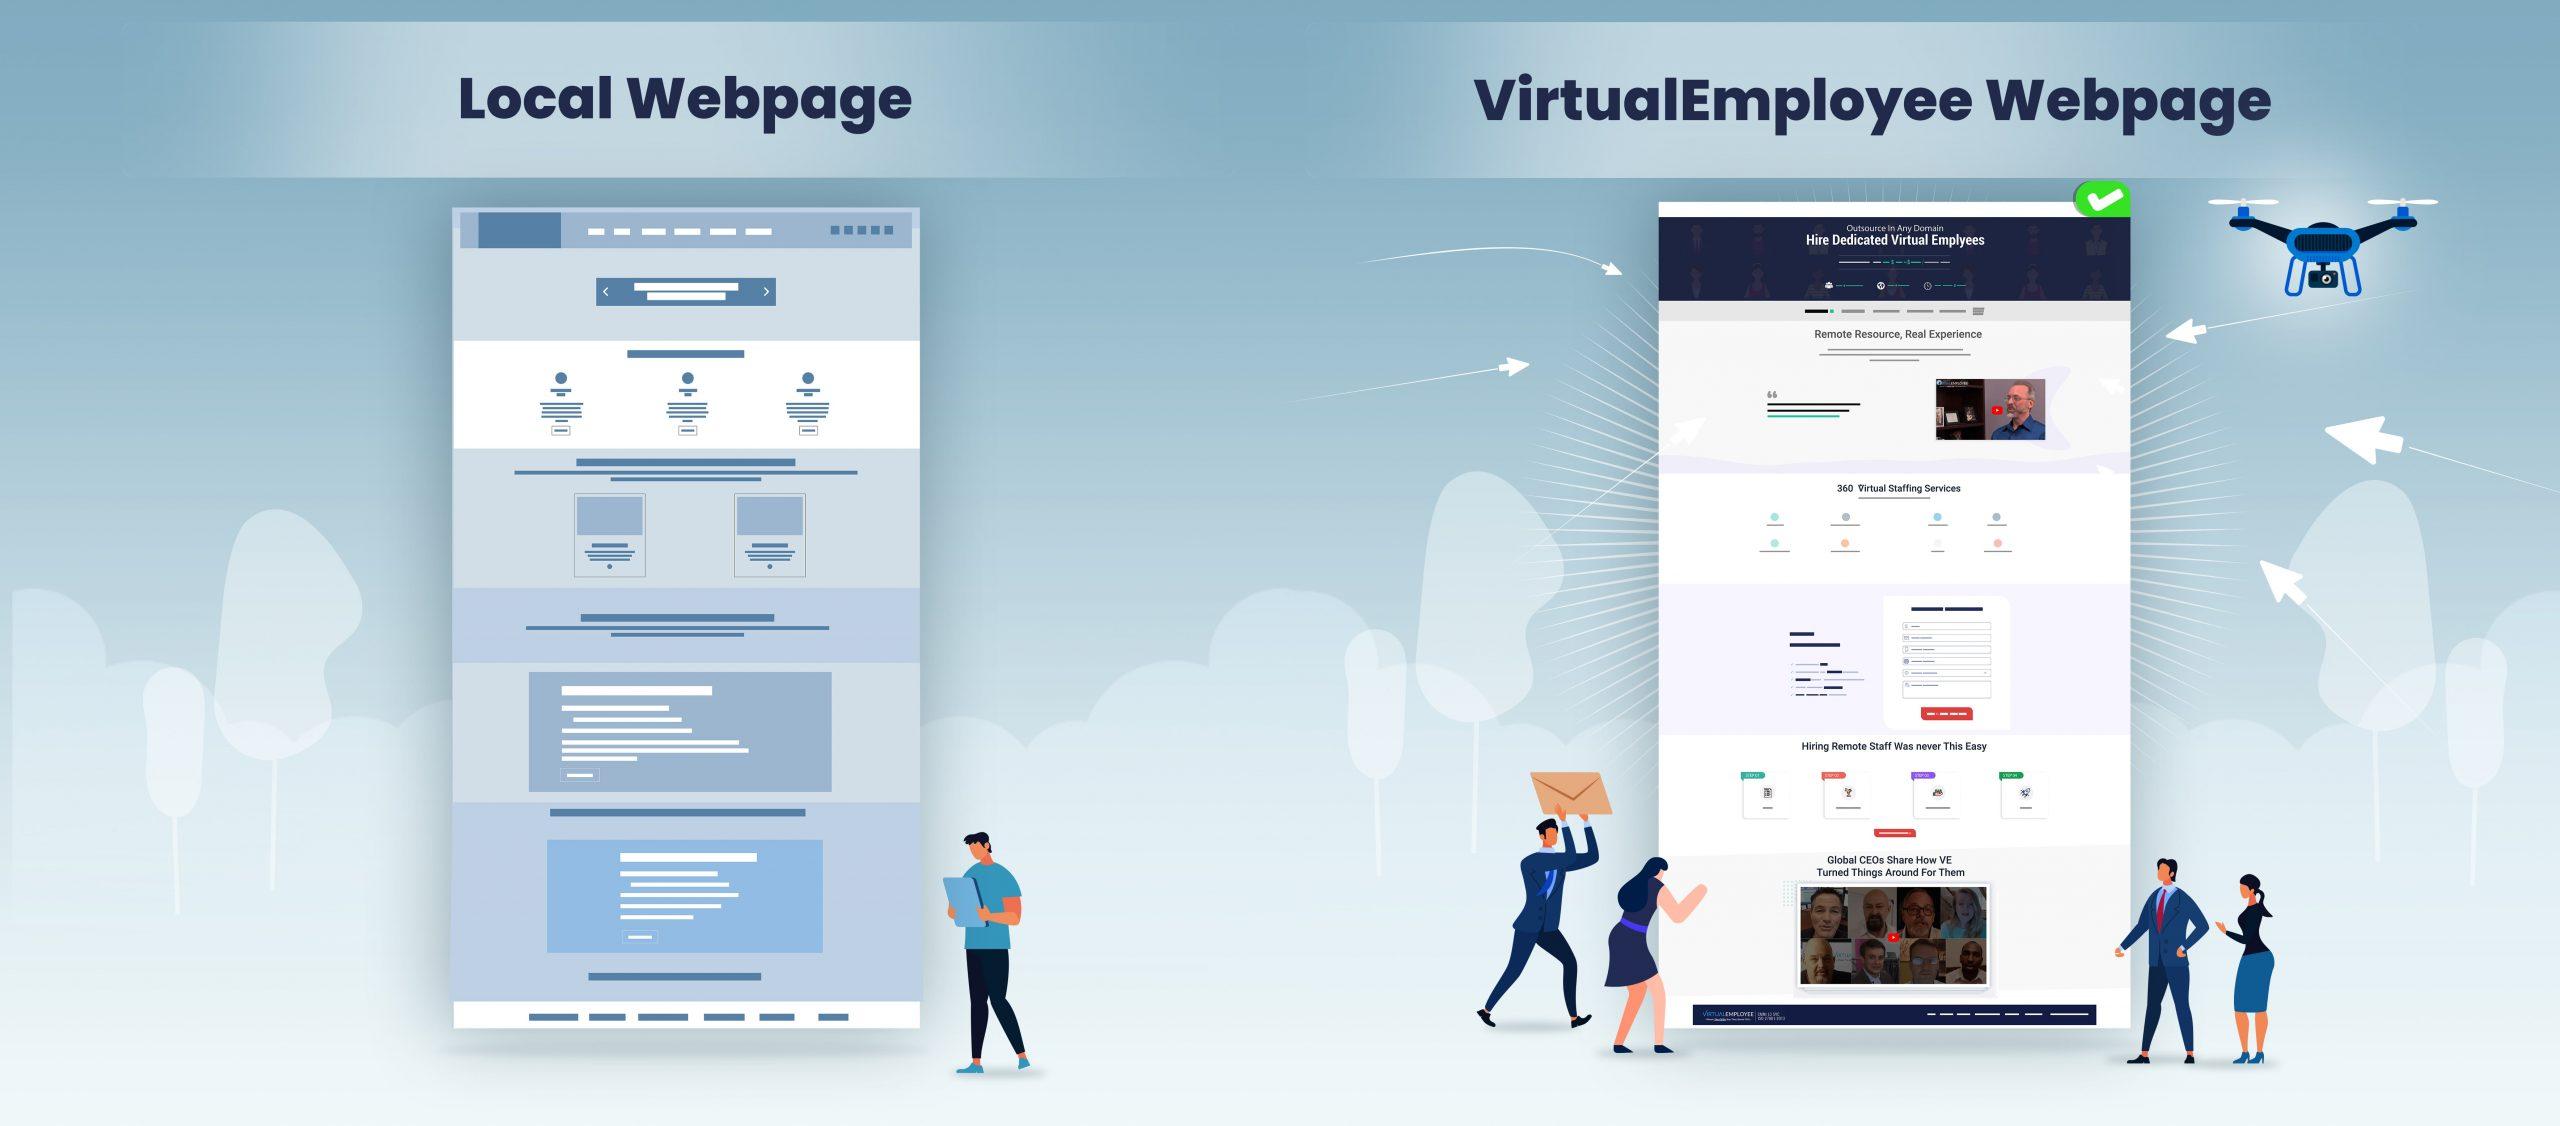 Local Webpage VE's Webpage